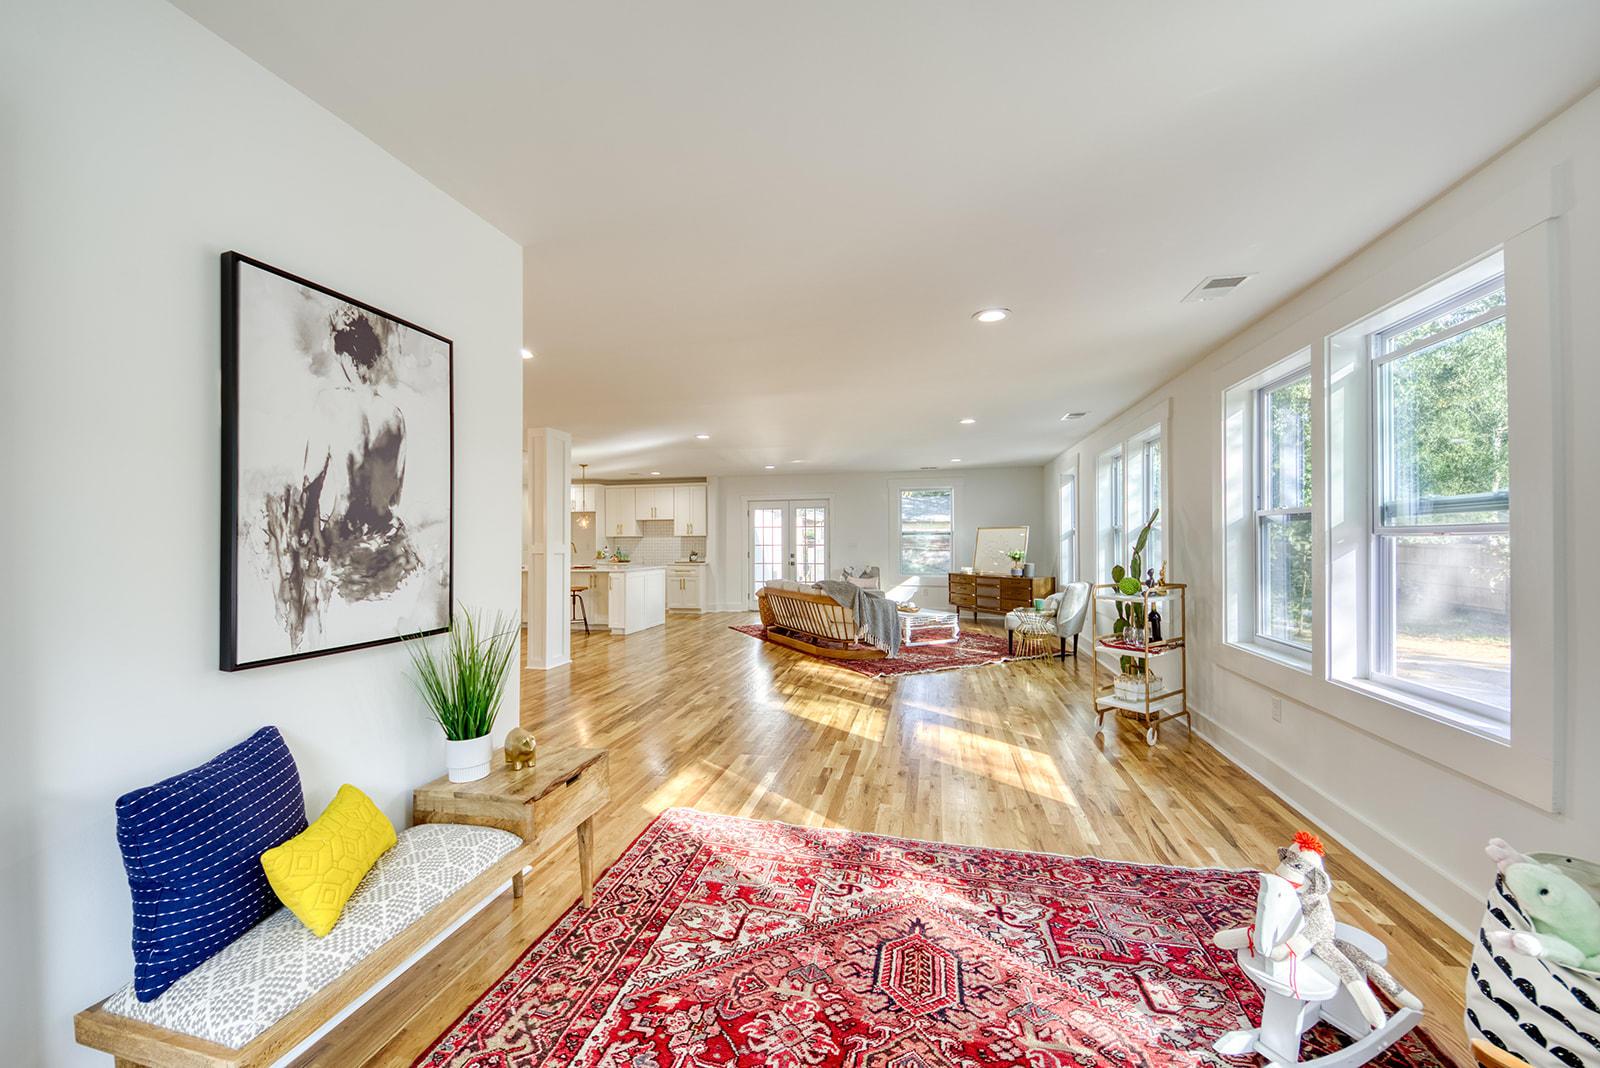 Bay View Acres Homes For Sale - 265 Coleman, Mount Pleasant, SC - 7